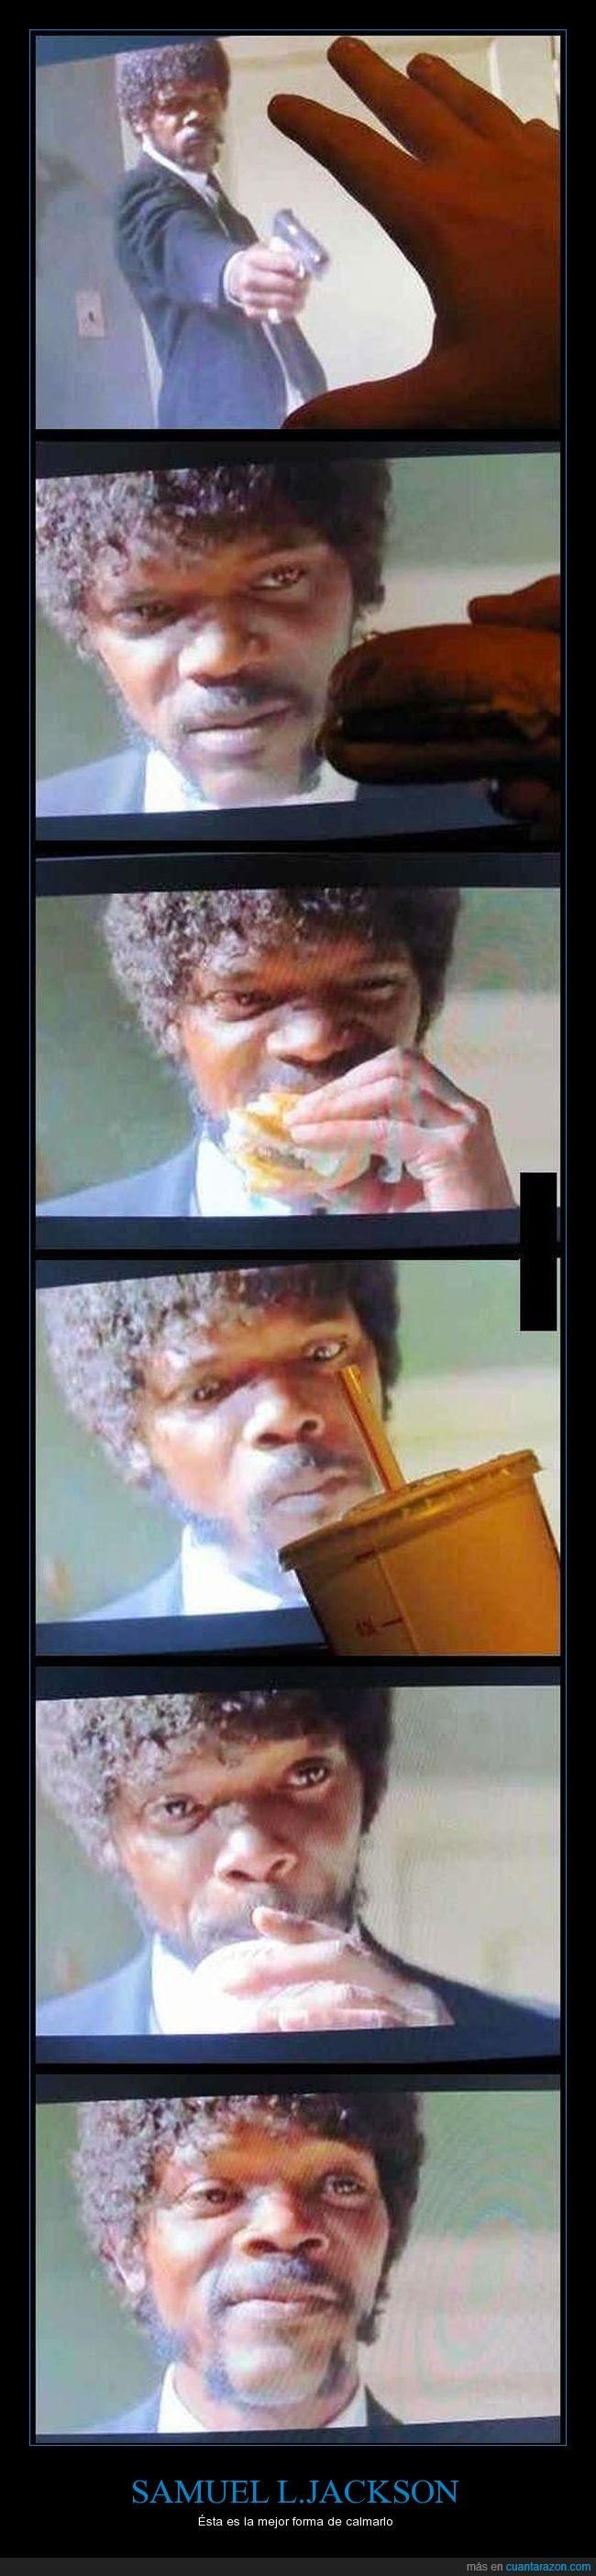 calmar,comida,hamburguesas,parar,patatas,Samuel L.Jackson